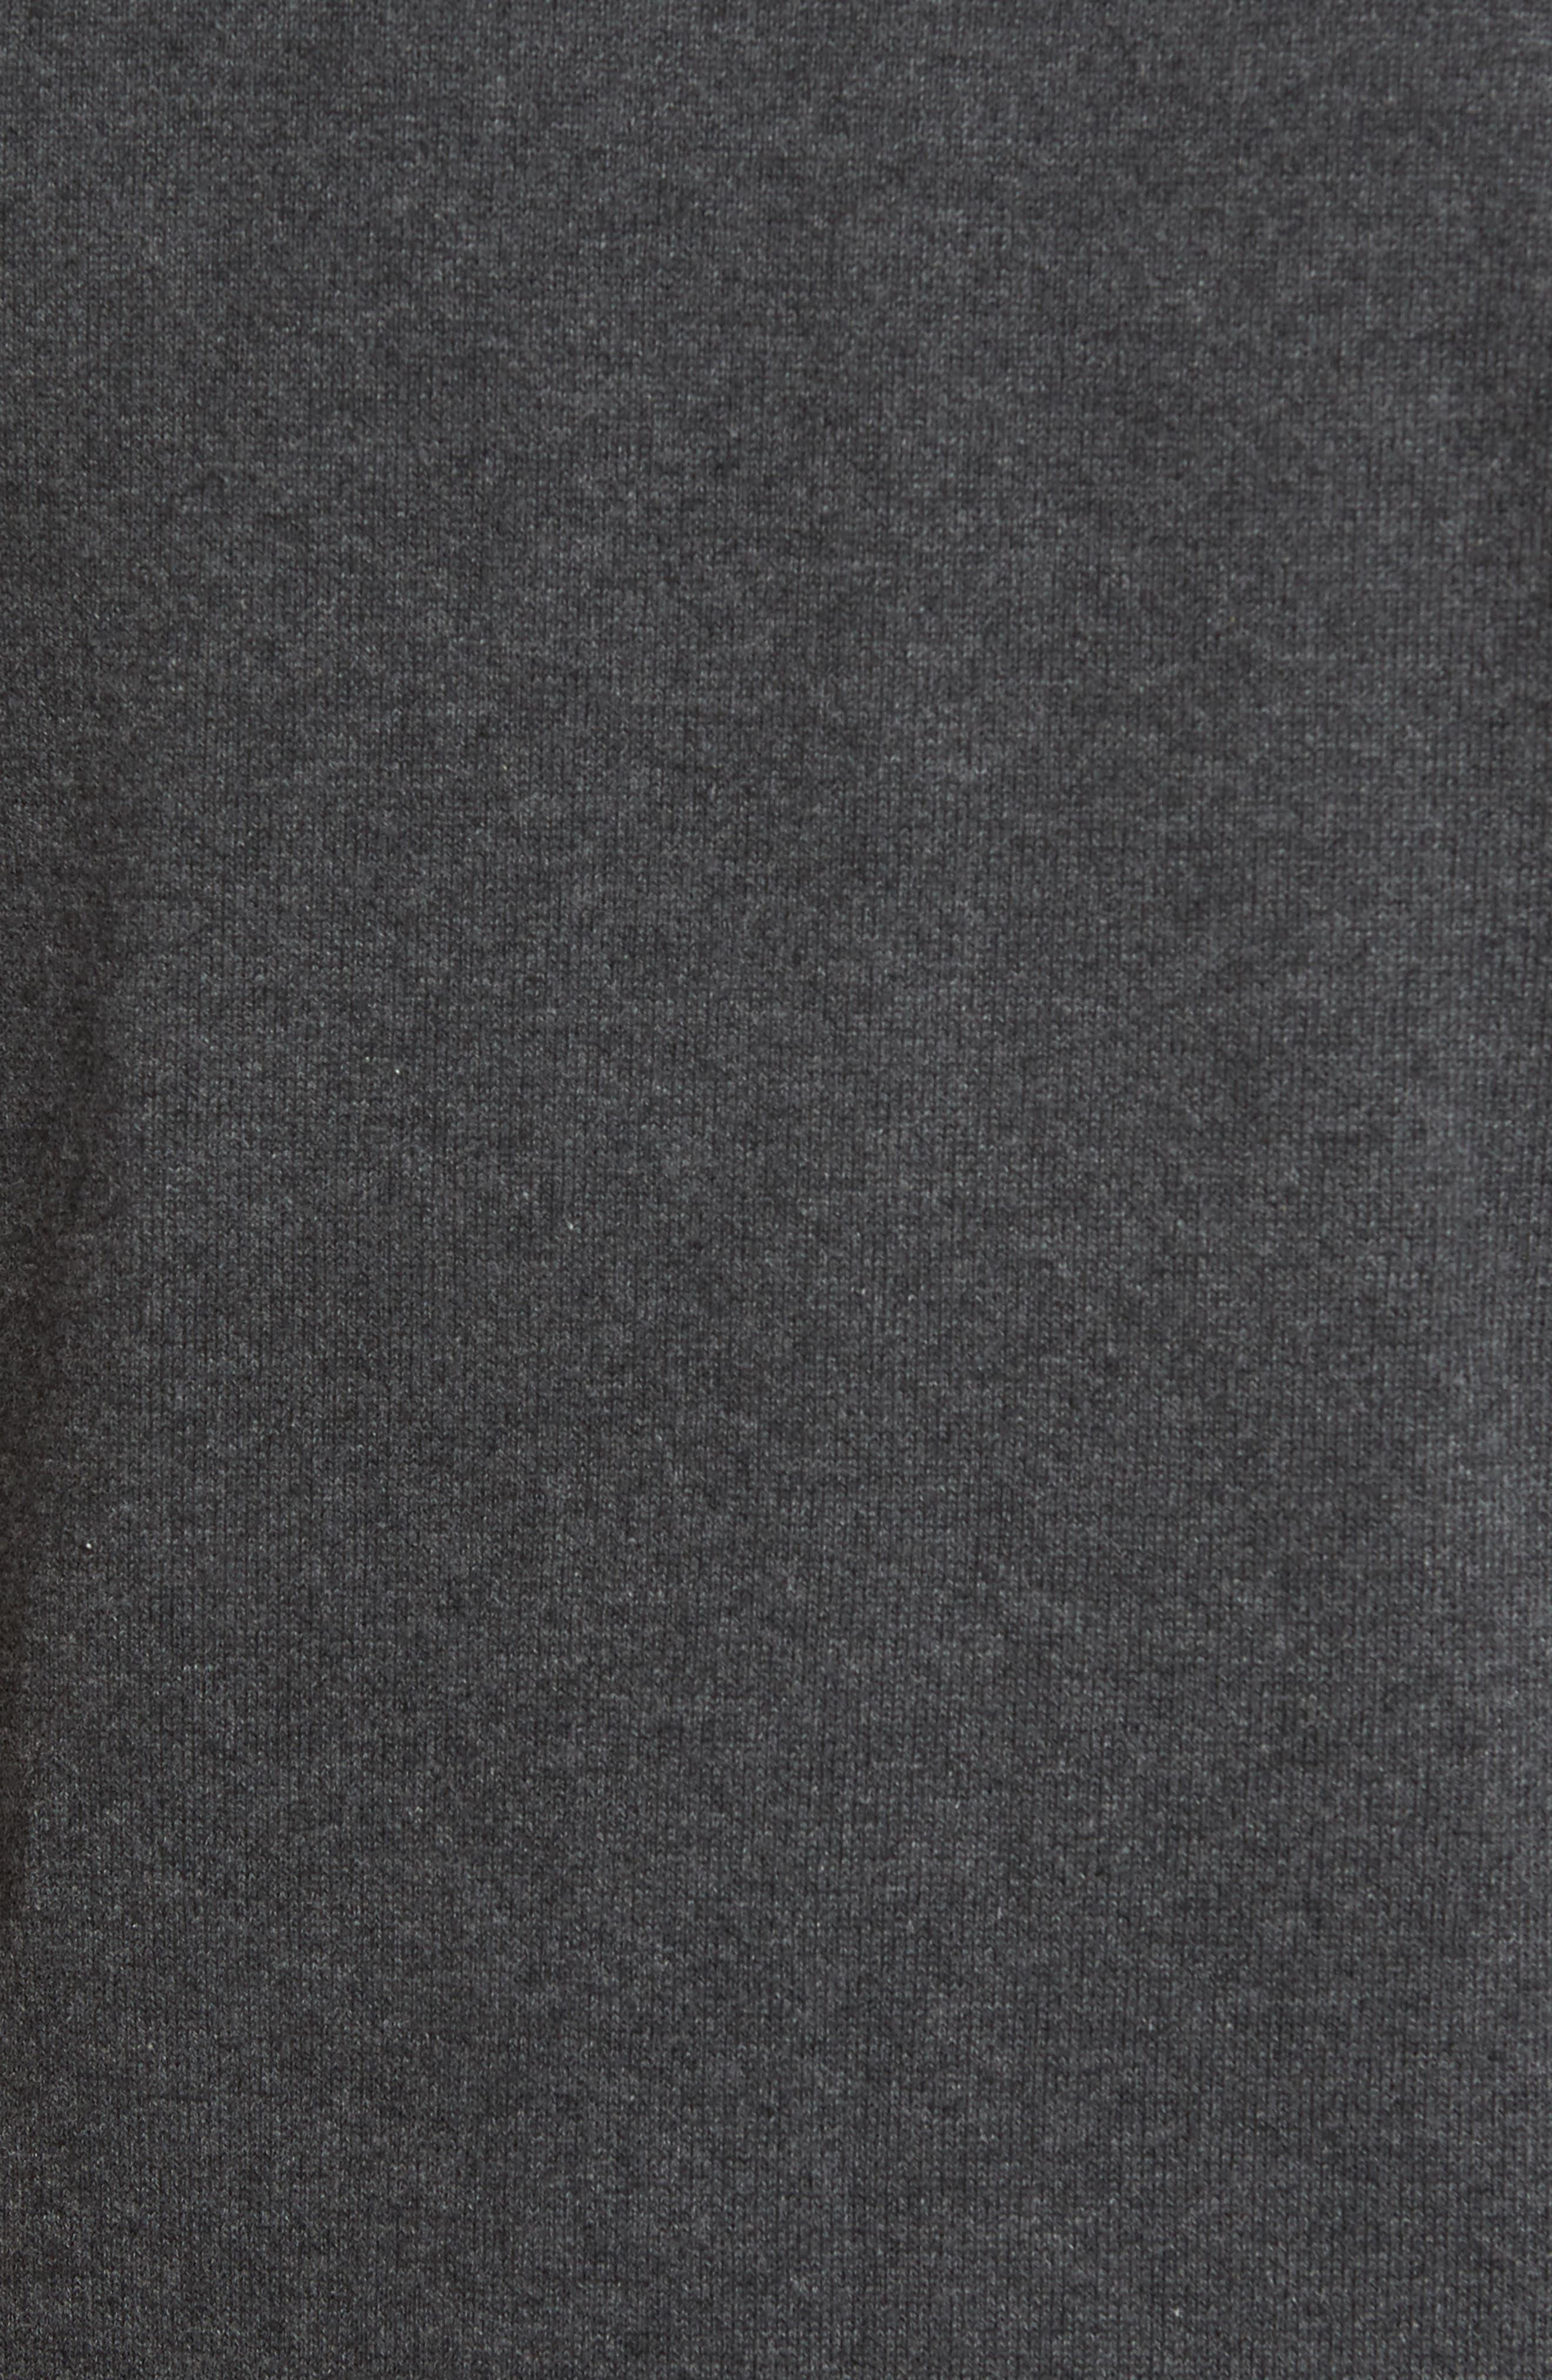 Lakemont V-Neck Sweater Vest,                             Alternate thumbnail 5, color,                             CHARCOAL HEATHER